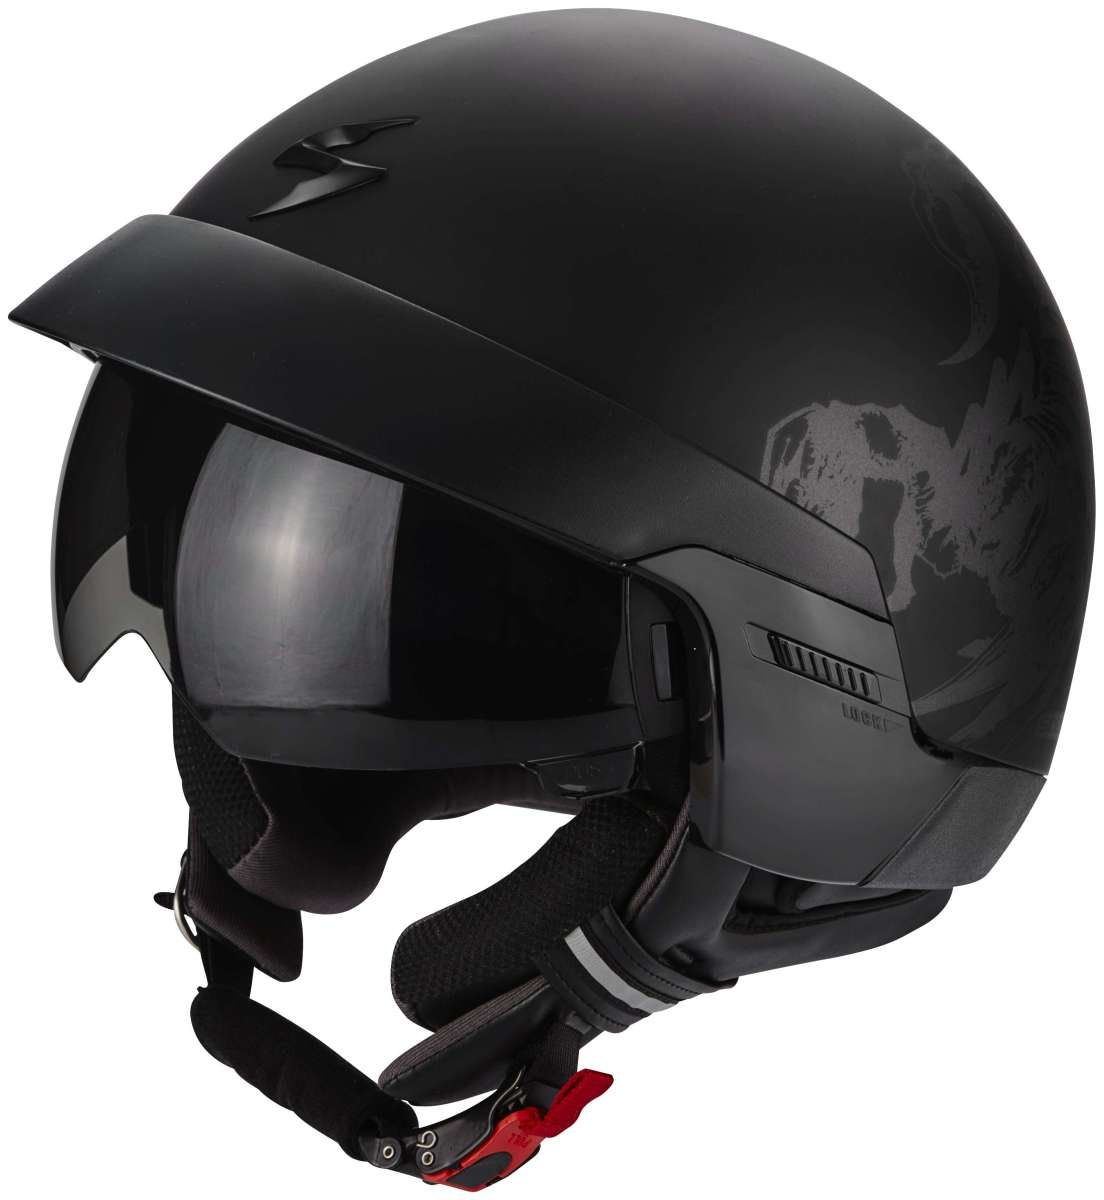 scorpion exo 100 jethelm matt schwarz cs bikewear. Black Bedroom Furniture Sets. Home Design Ideas